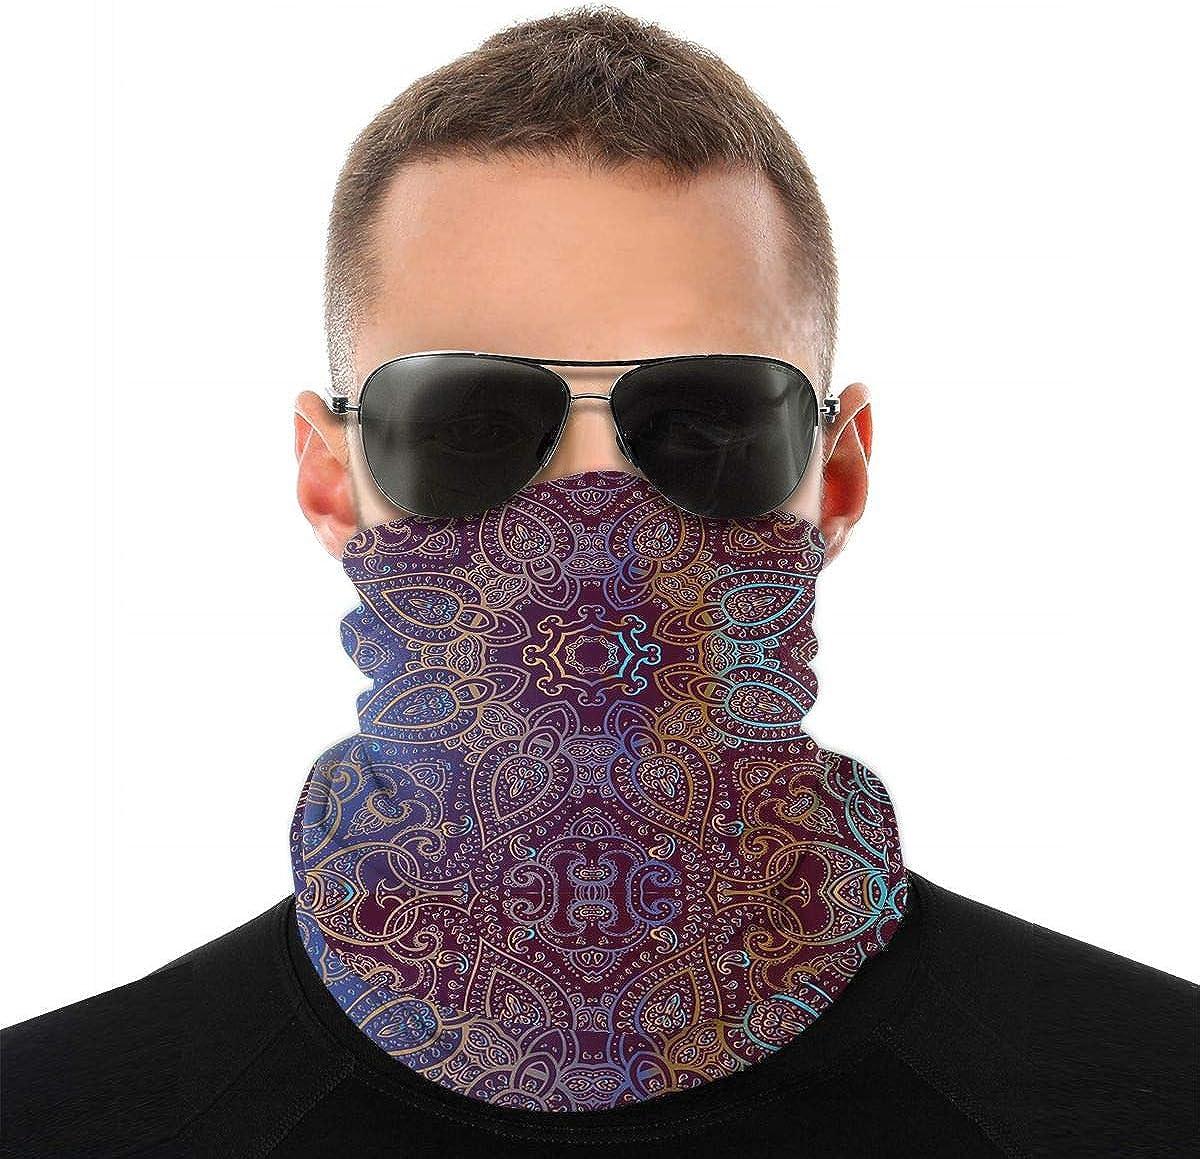 KiuLoam Mandala Indian Decorative Seamless Face Mask Bandanas Neck Gaiter for Men and Women, Multifunction Headband Scarf for Dust, Outdoors, Sports